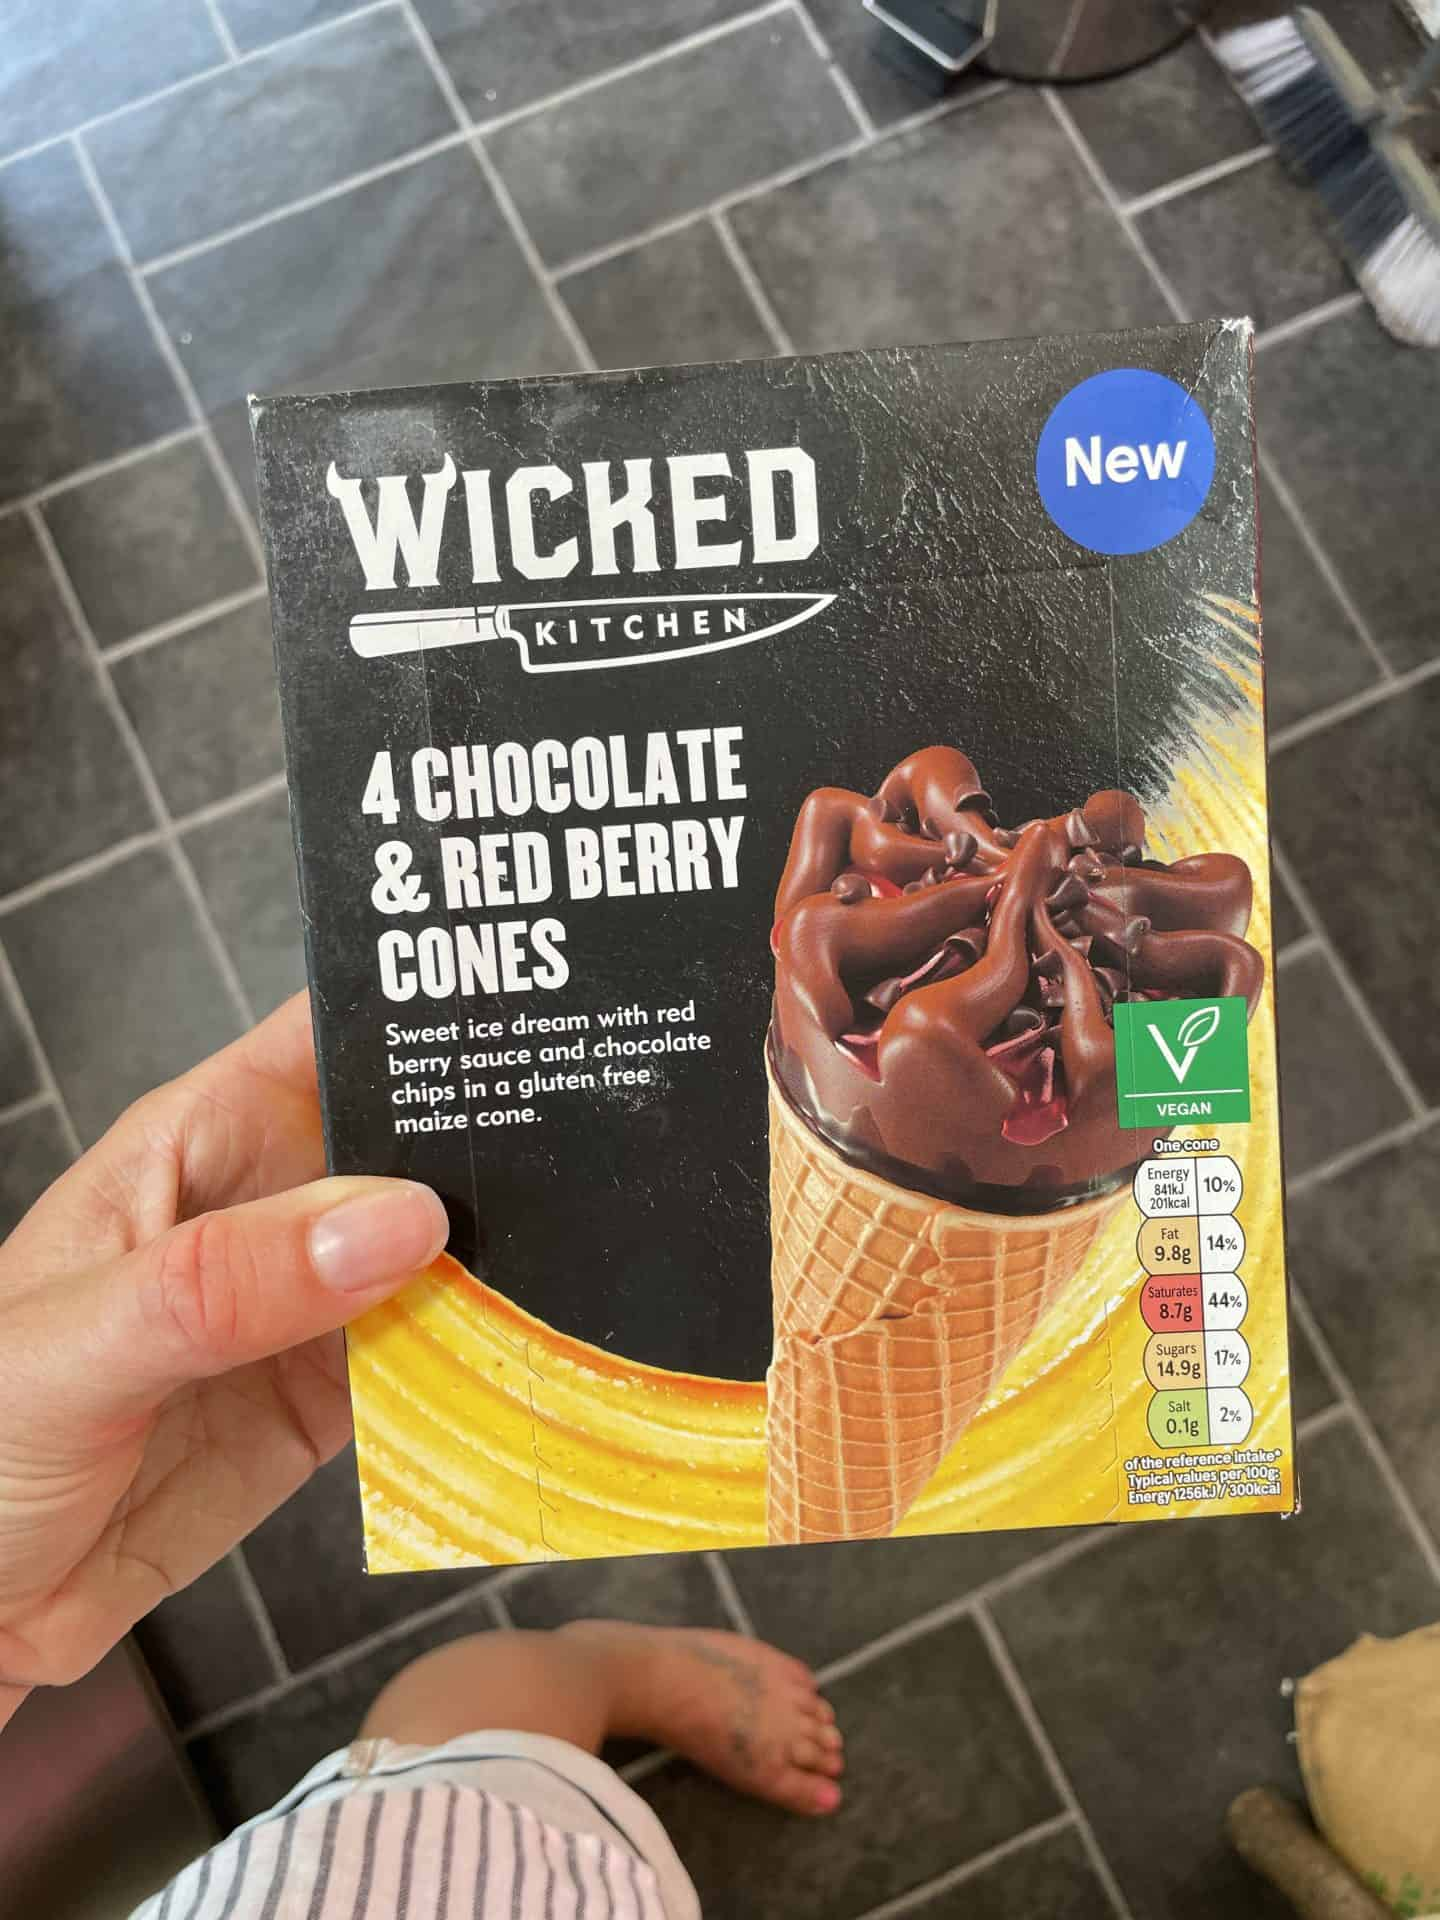 wicked kichen chocolate raspberry cones